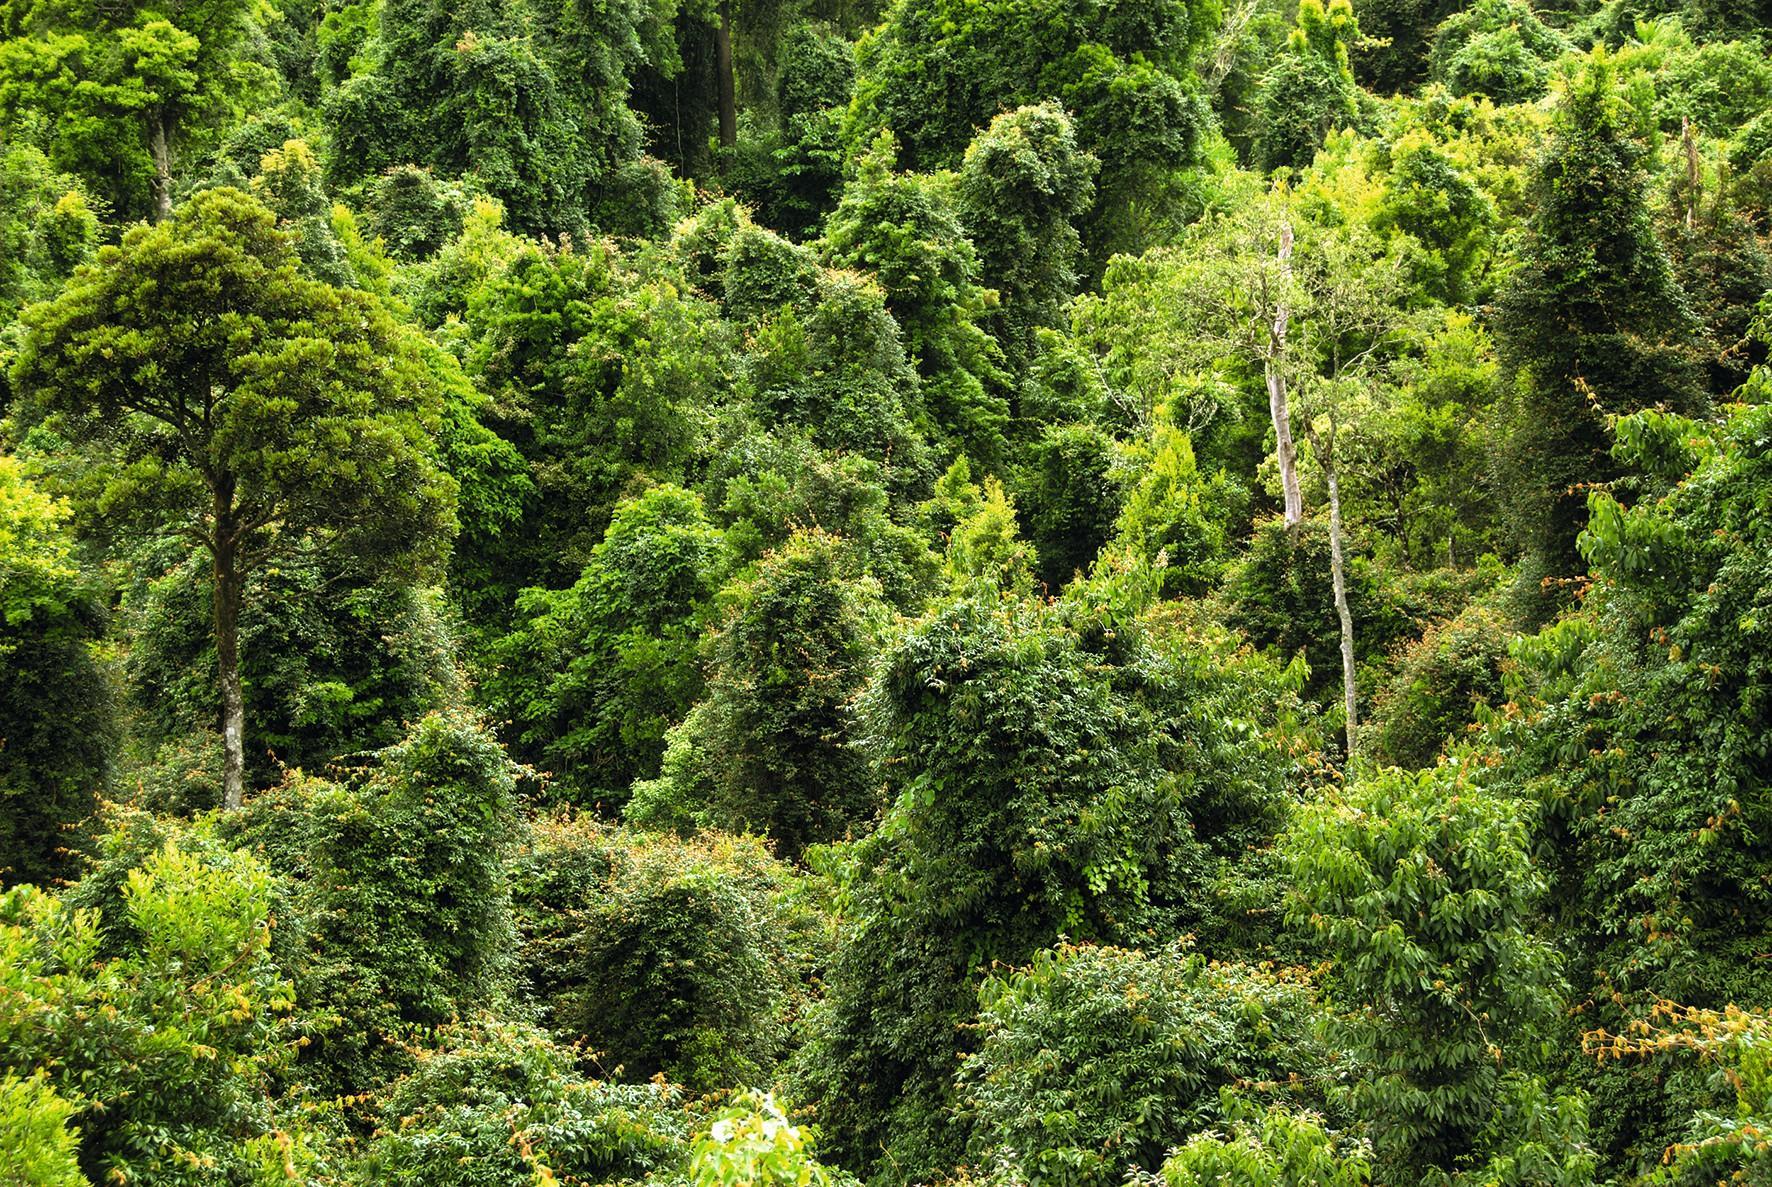 La respiration des plantes